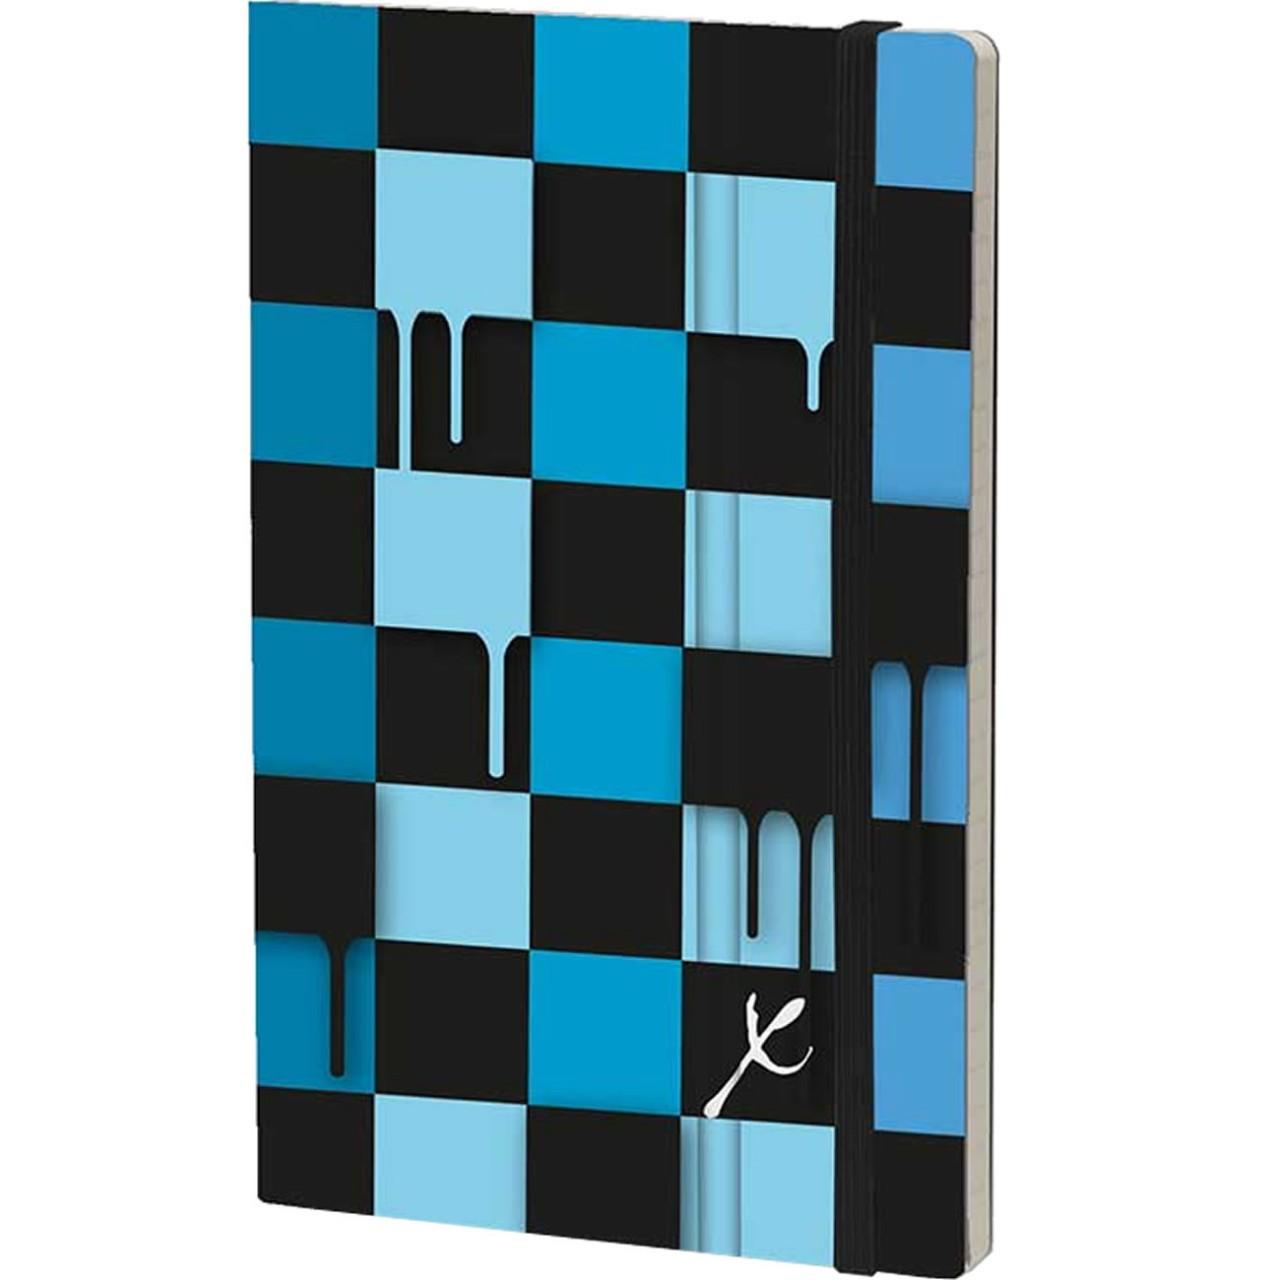 Stifflexible Notizbuch CHESS 9 x 14 cm 144 S., BLUE